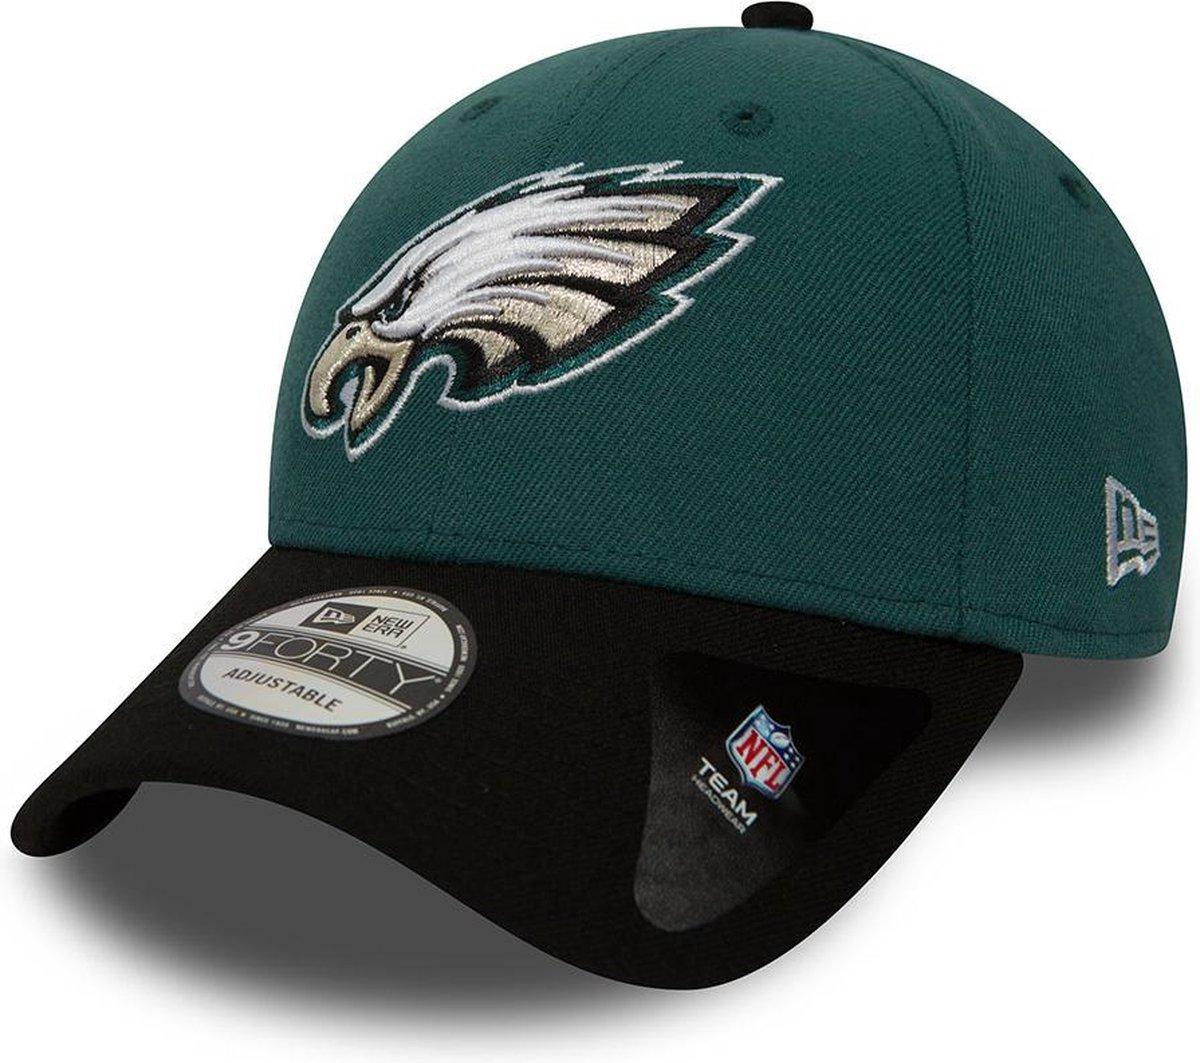 New Era Cap 9FORTY Philadelphia Eagles NFL - One Size - Midnight Green/Black - New Era